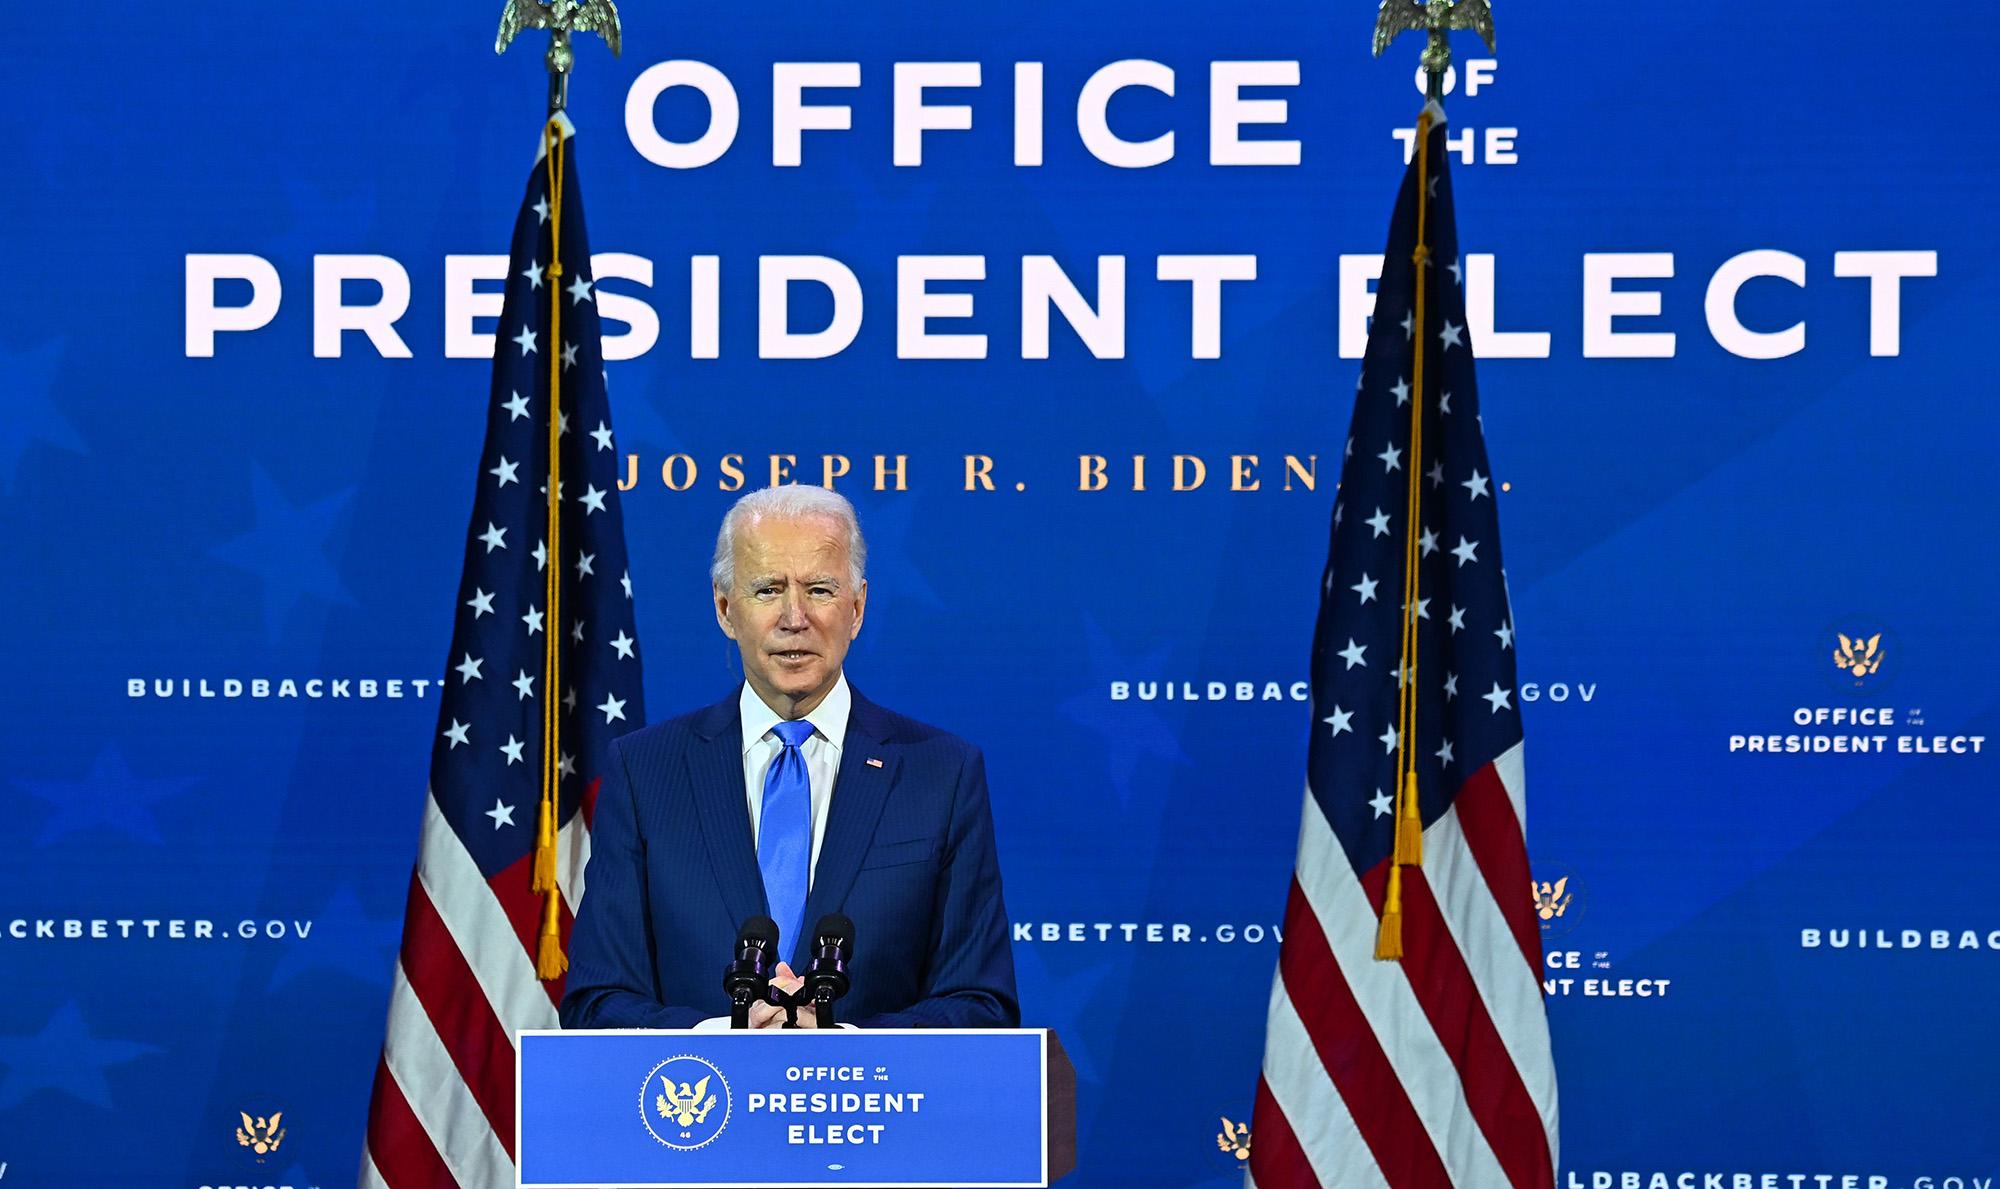 U.S. President-elect Joe Biden announces his economic team at The Queen Theater in Wilmington, Delaware, on December 1.